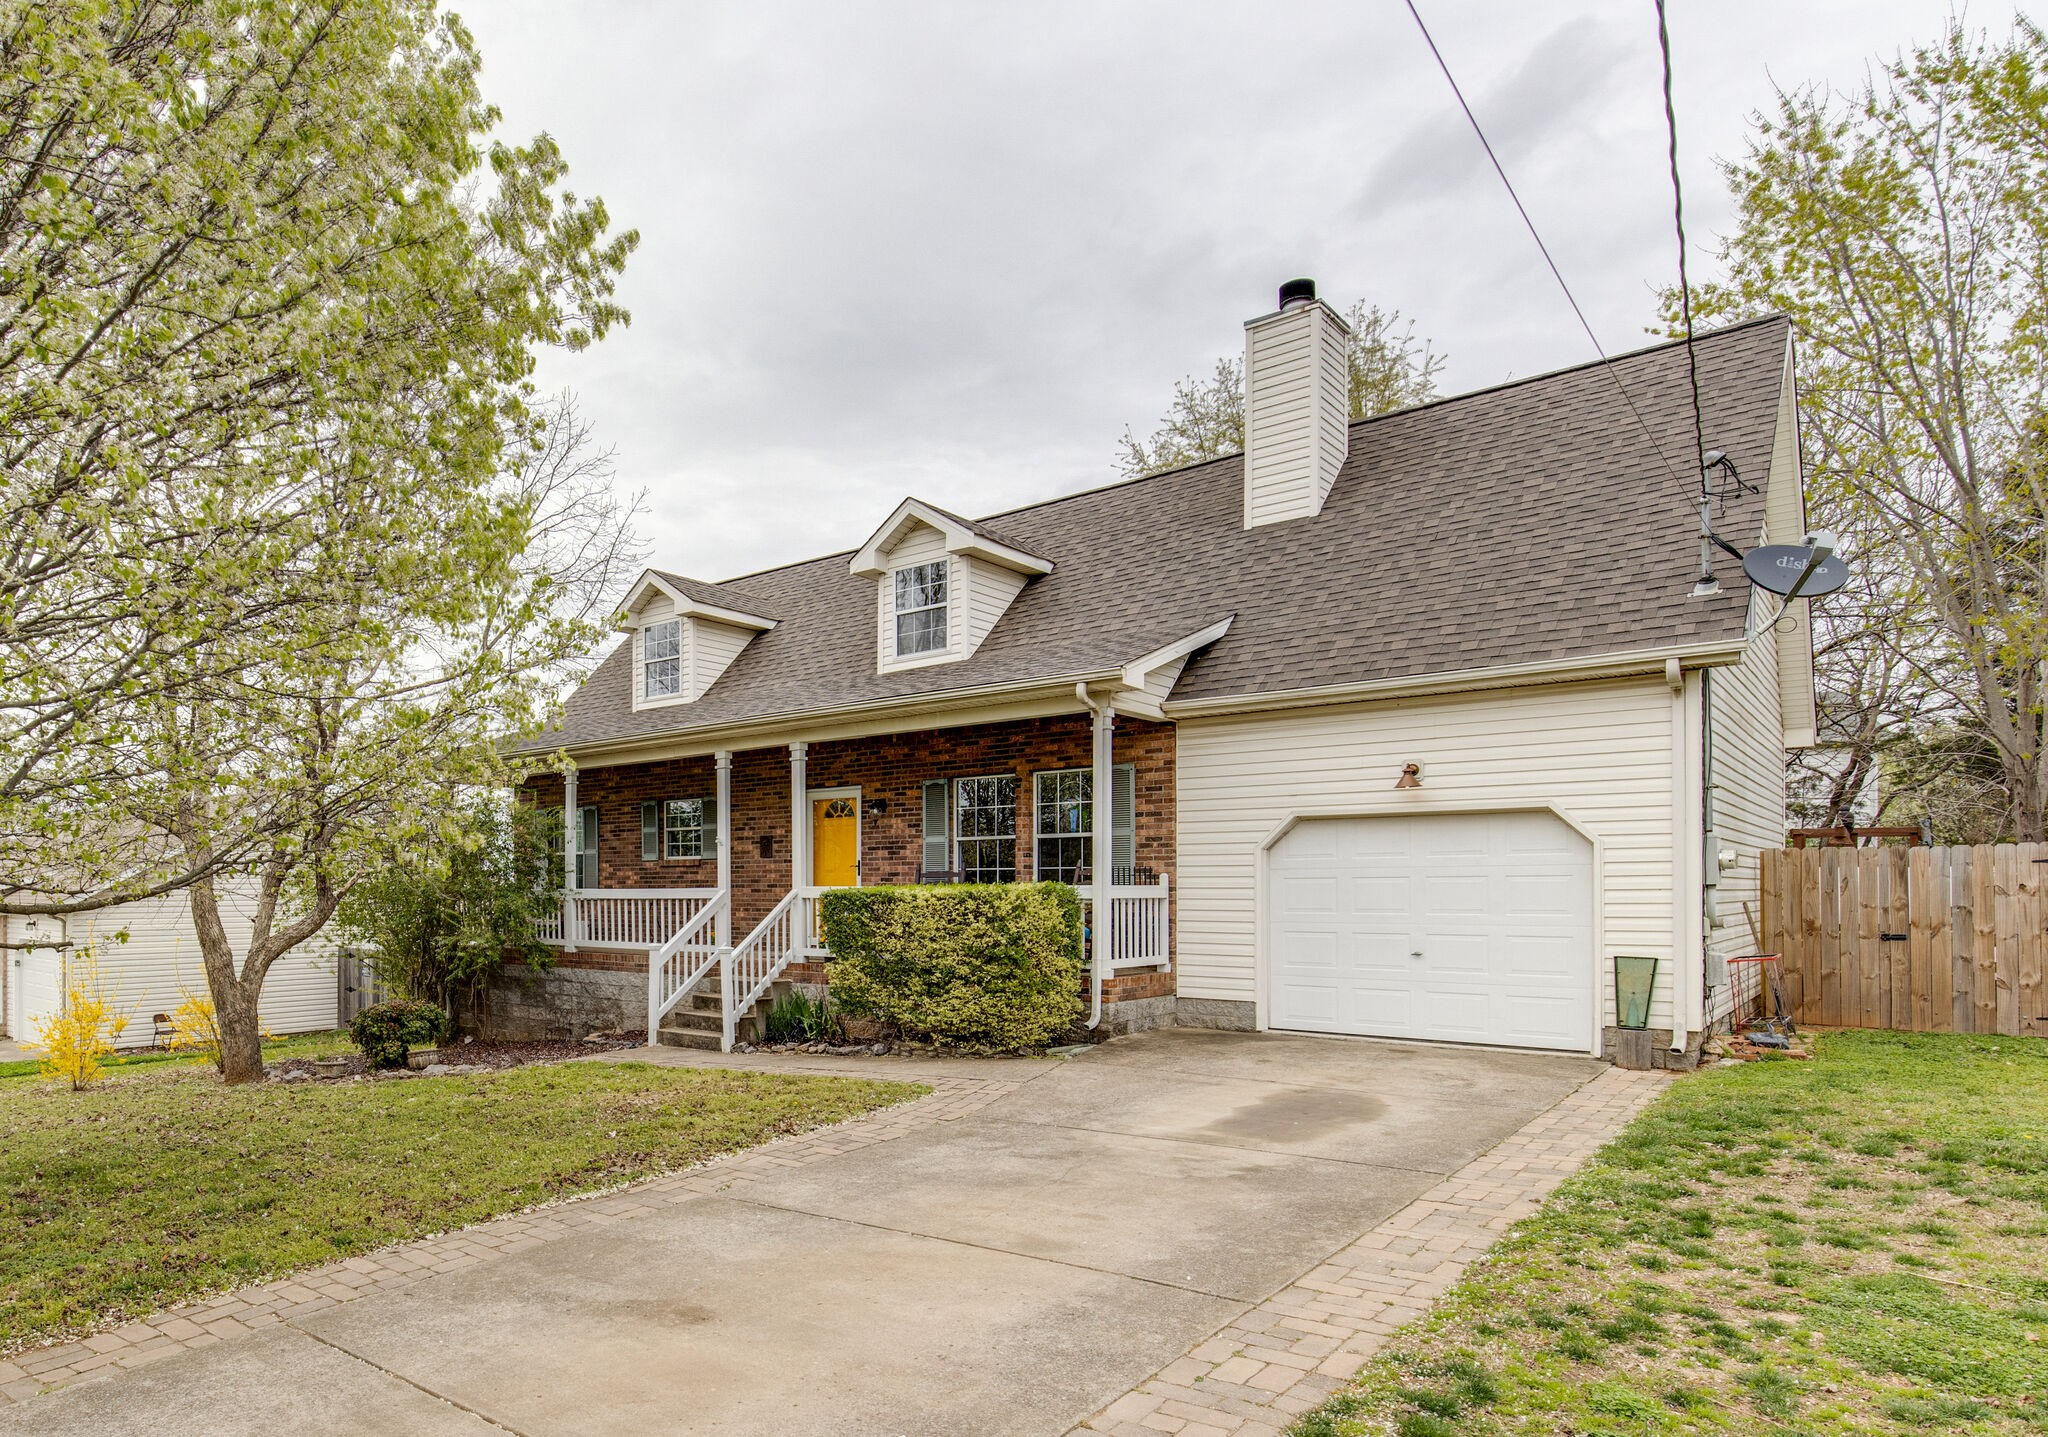 937 Tal Ln Property Photo - LA VERGNE, TN real estate listing